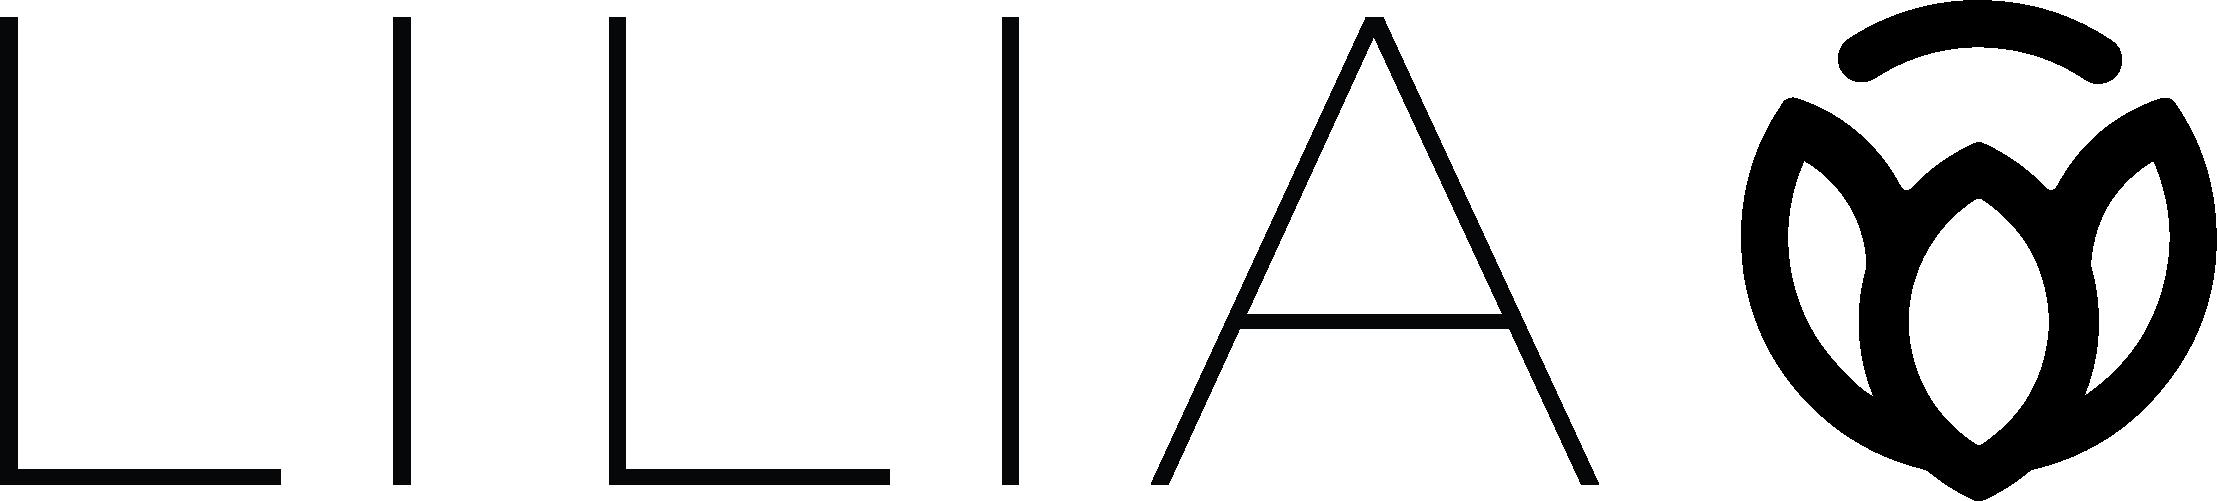 logo w emblem.png